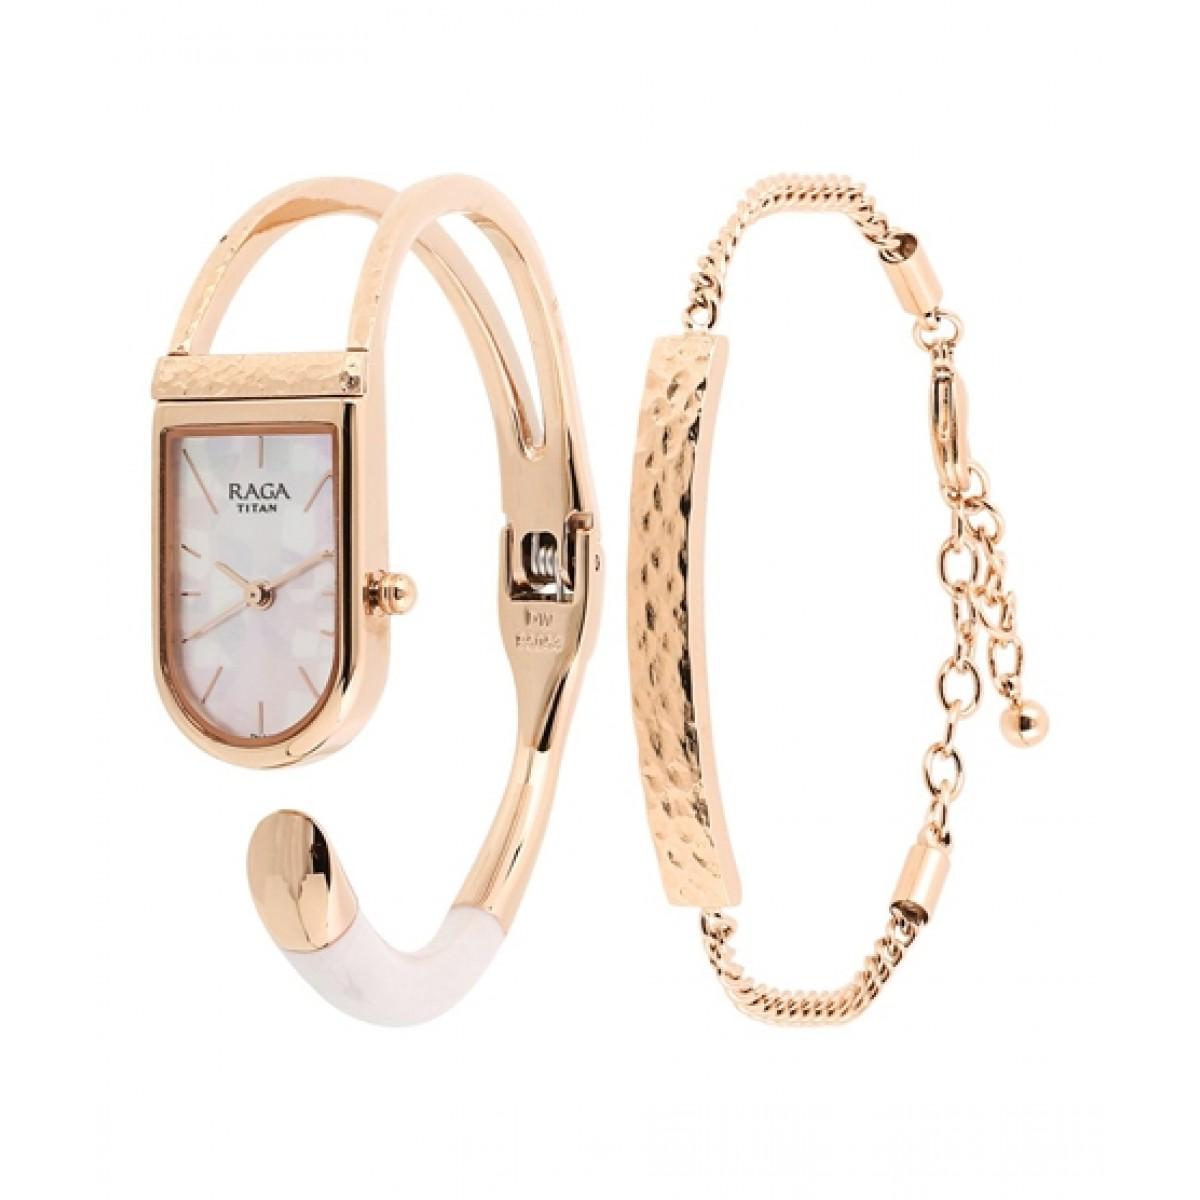 Titan Raga Espana Women S Watch Price In Pakistan Buy Titan Women S Watch Rose Gold 2583wm01 Ishopping Pk